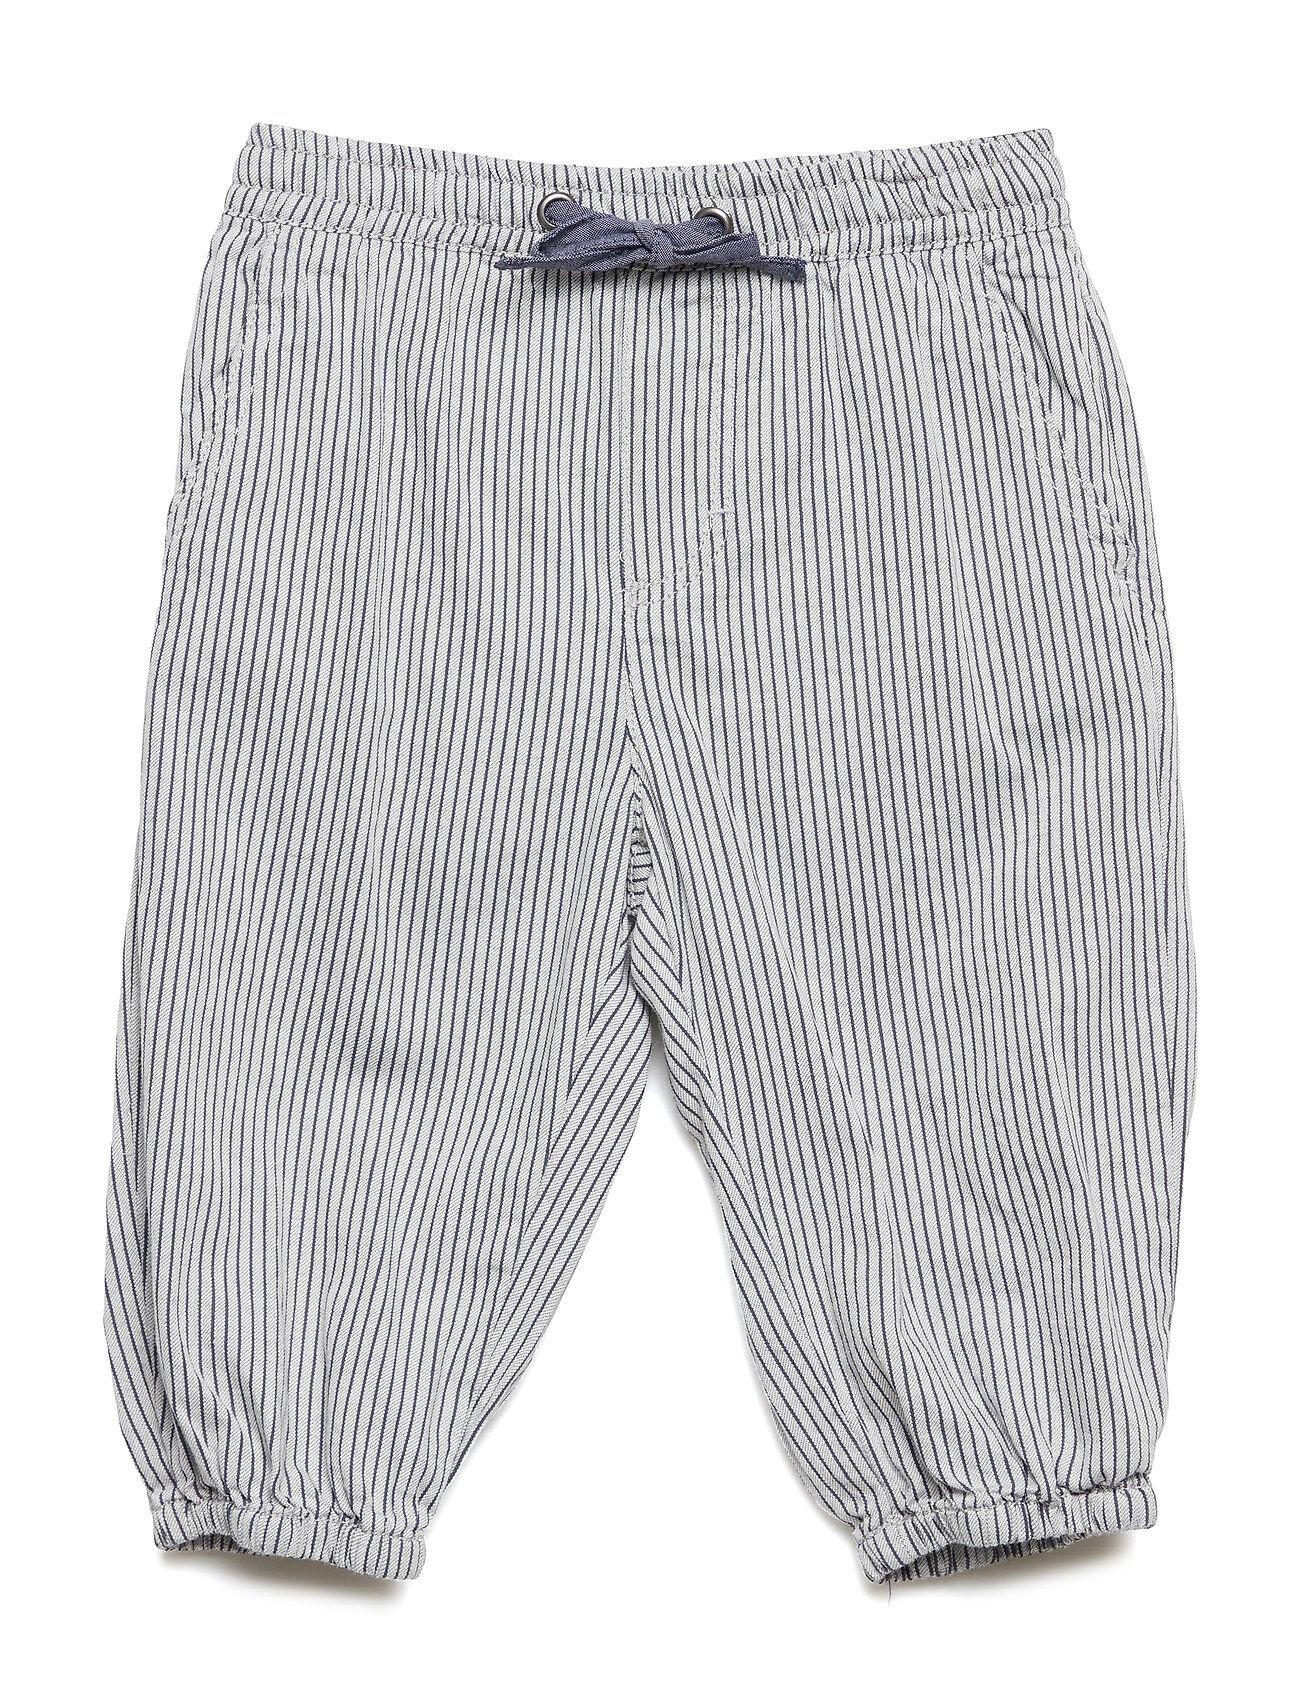 Wheat Trousers Gustav